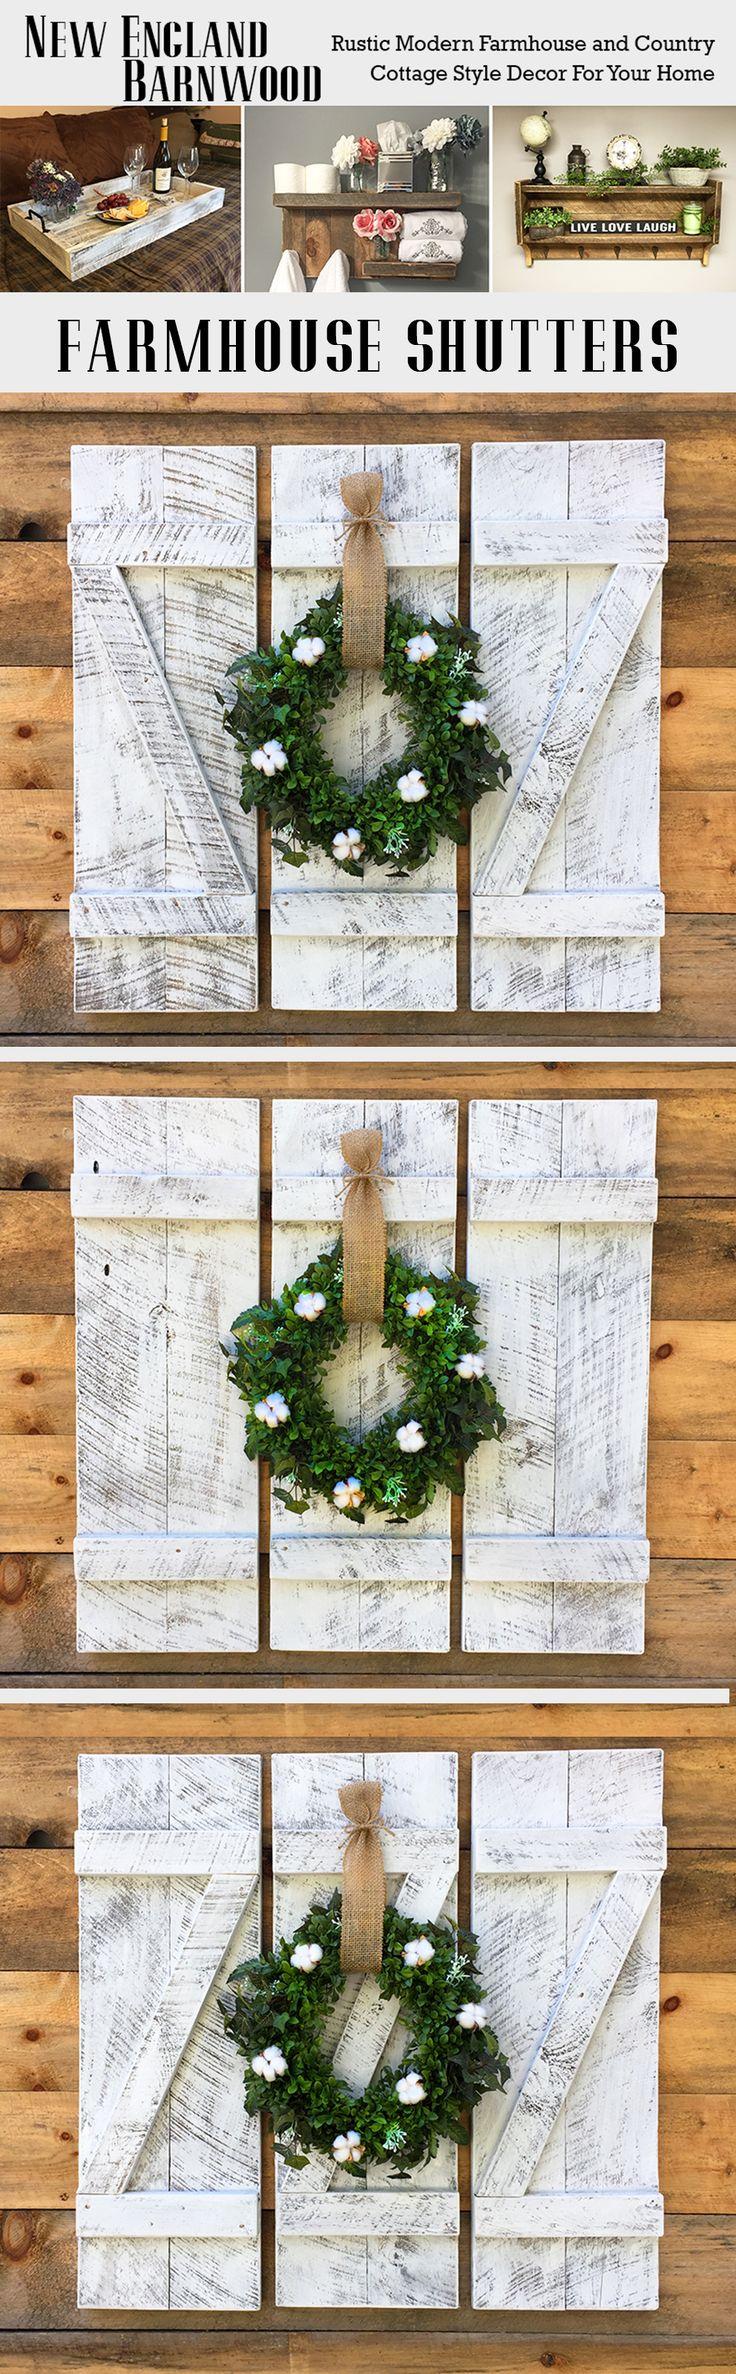 25 Best Rustic Interior Shutters Ideas On Pinterest Rustic Window Treatments Interior